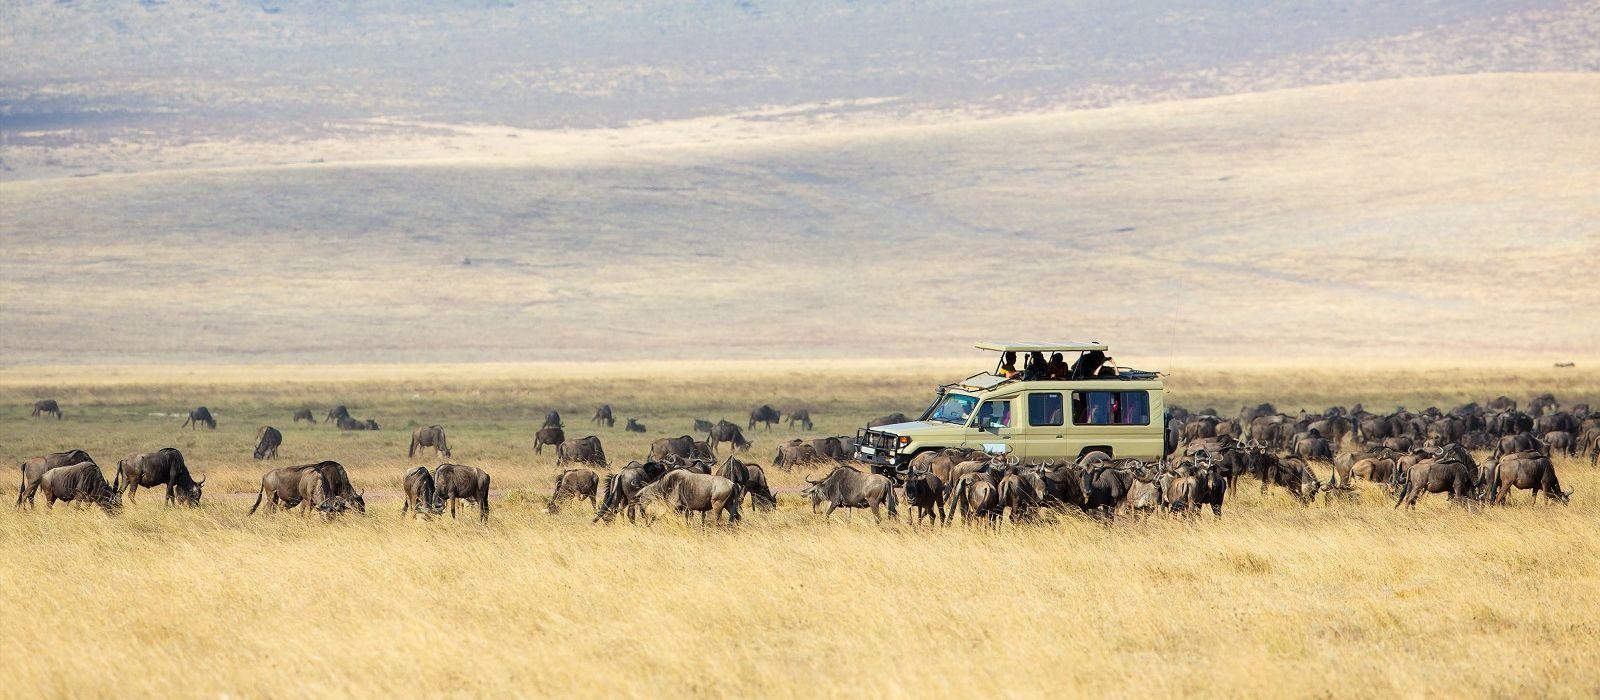 Tansania: Safari & authentische Einblicke Urlaub 3